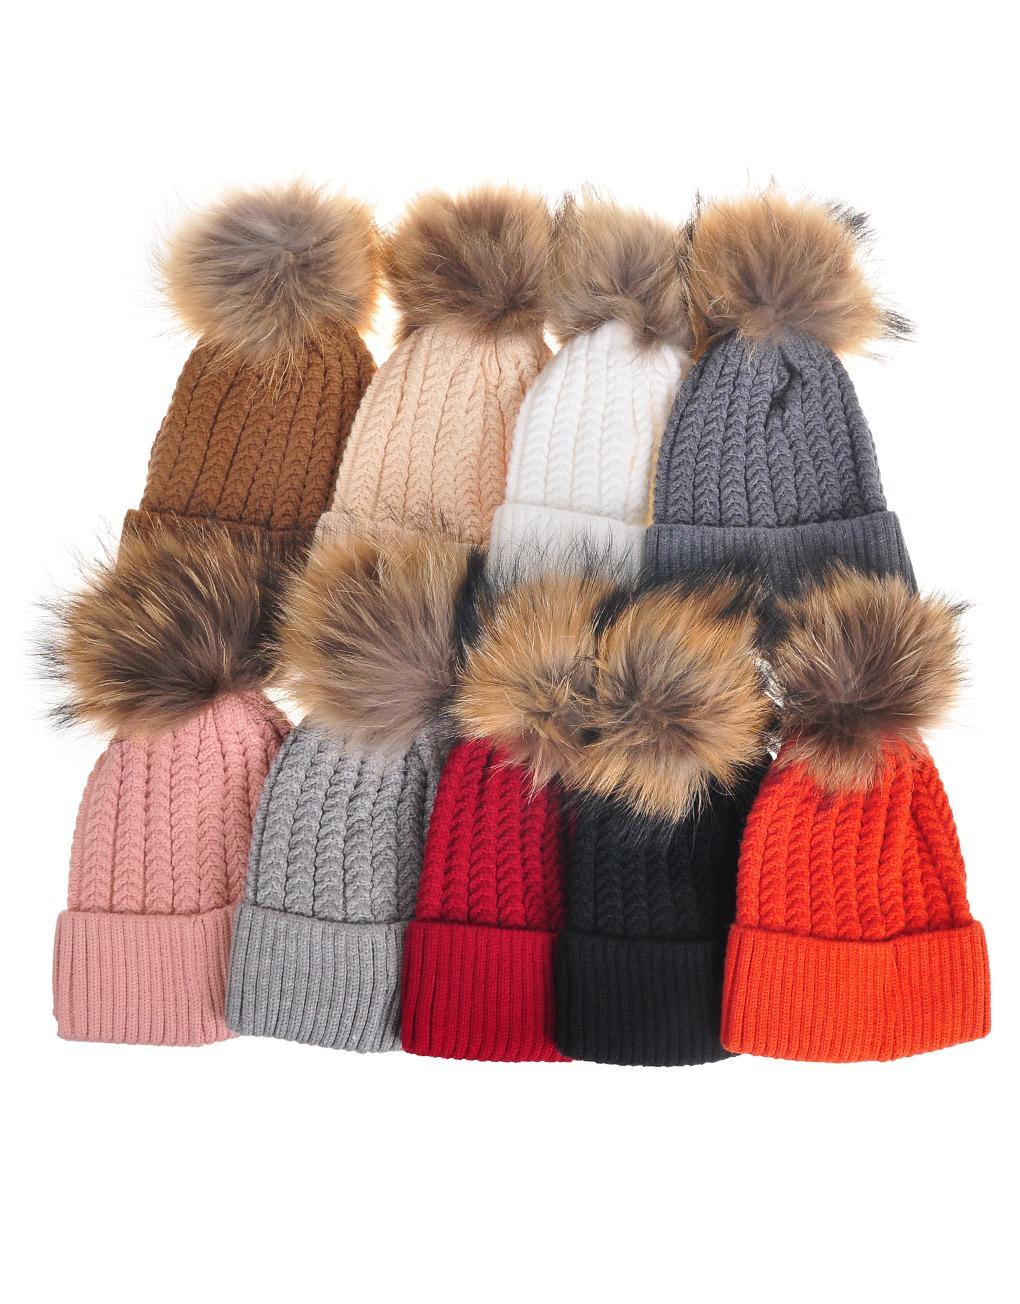 c9246698e36db2 Slim Pom pom beanie Hats - Luxe Wholesale